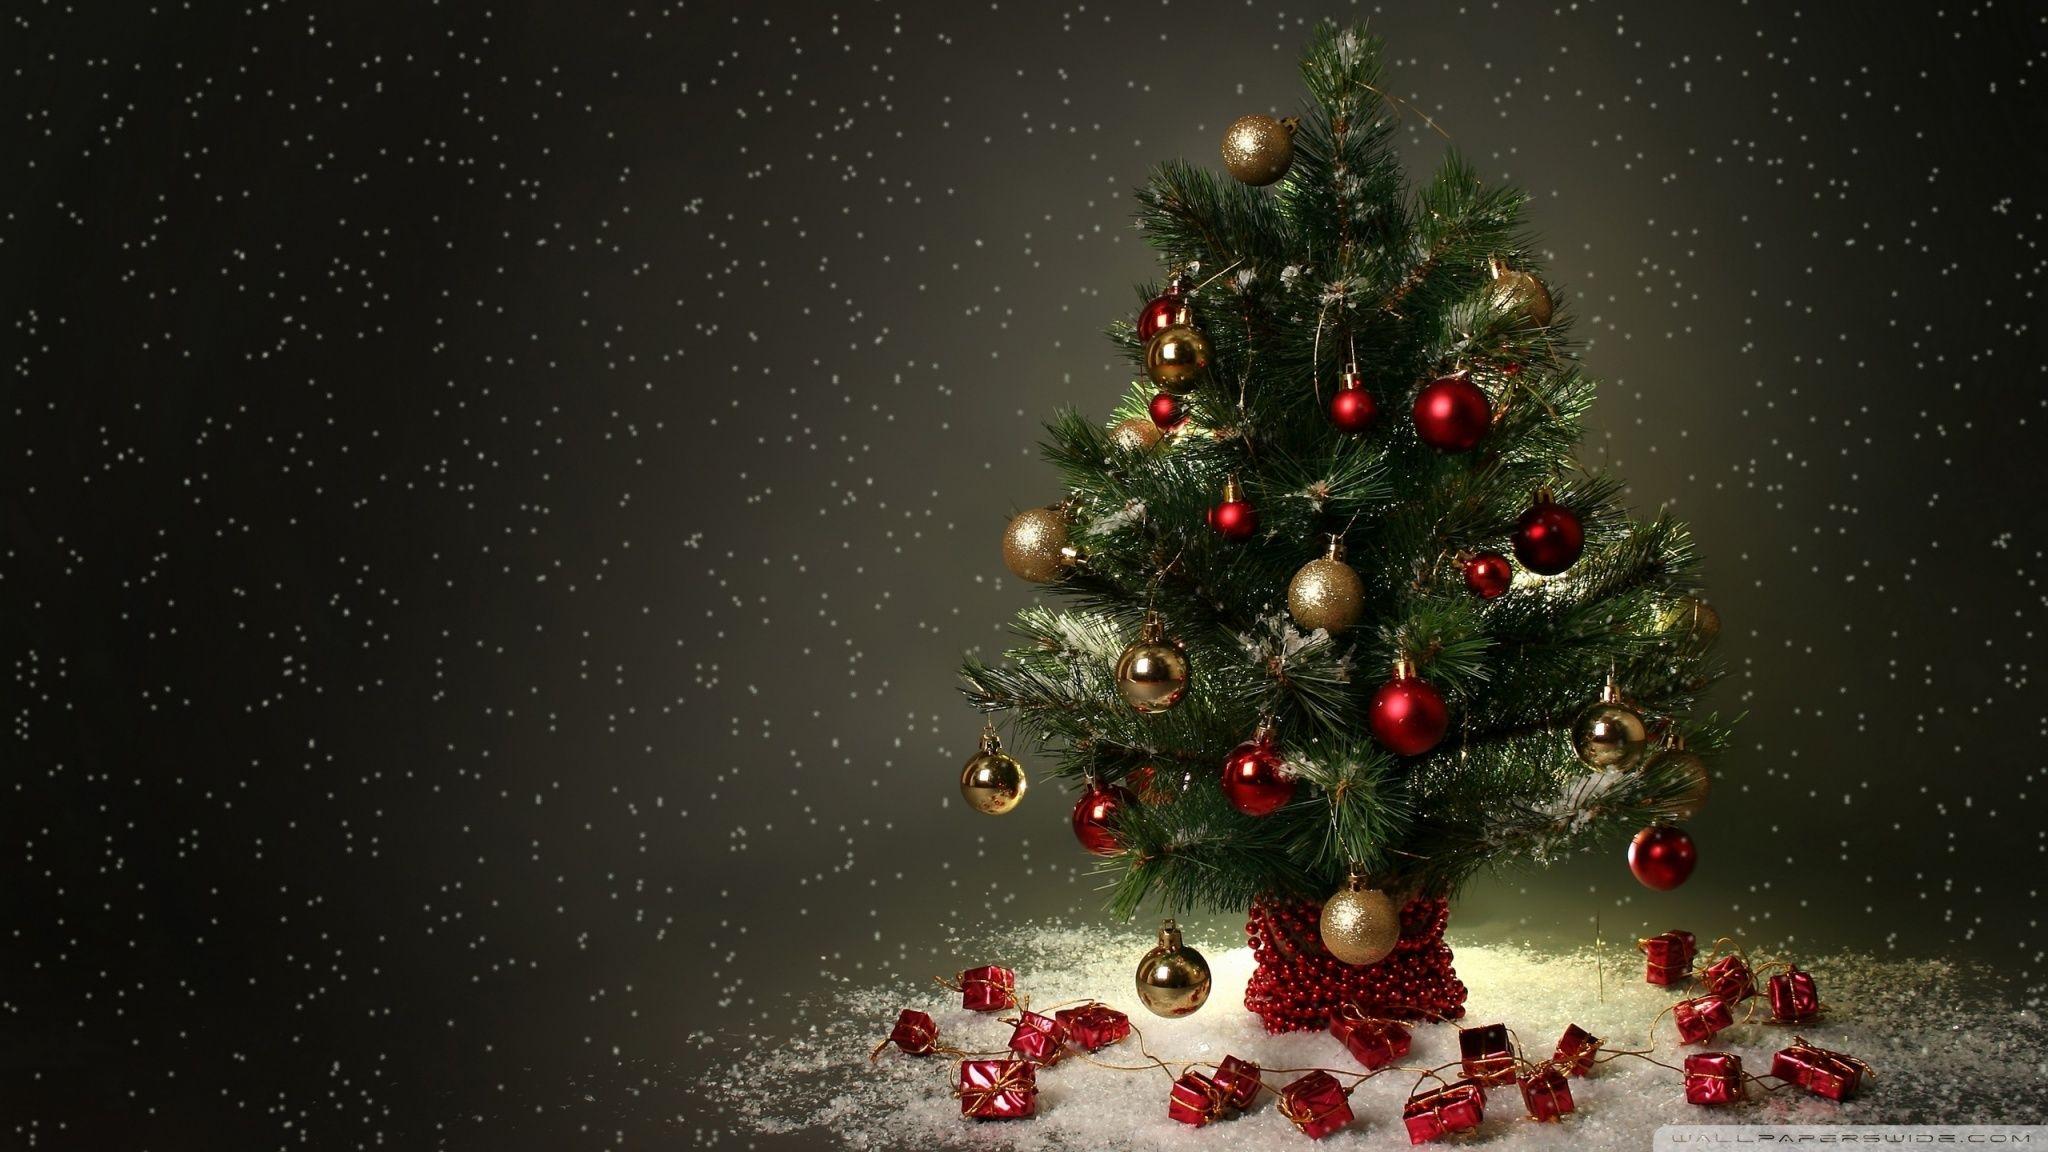 Beautiful Christmas Beautiful Christmas Tree Pictures Hd Christmas Tree Wallpaper Christmas Tree Background Christmas Tree Images